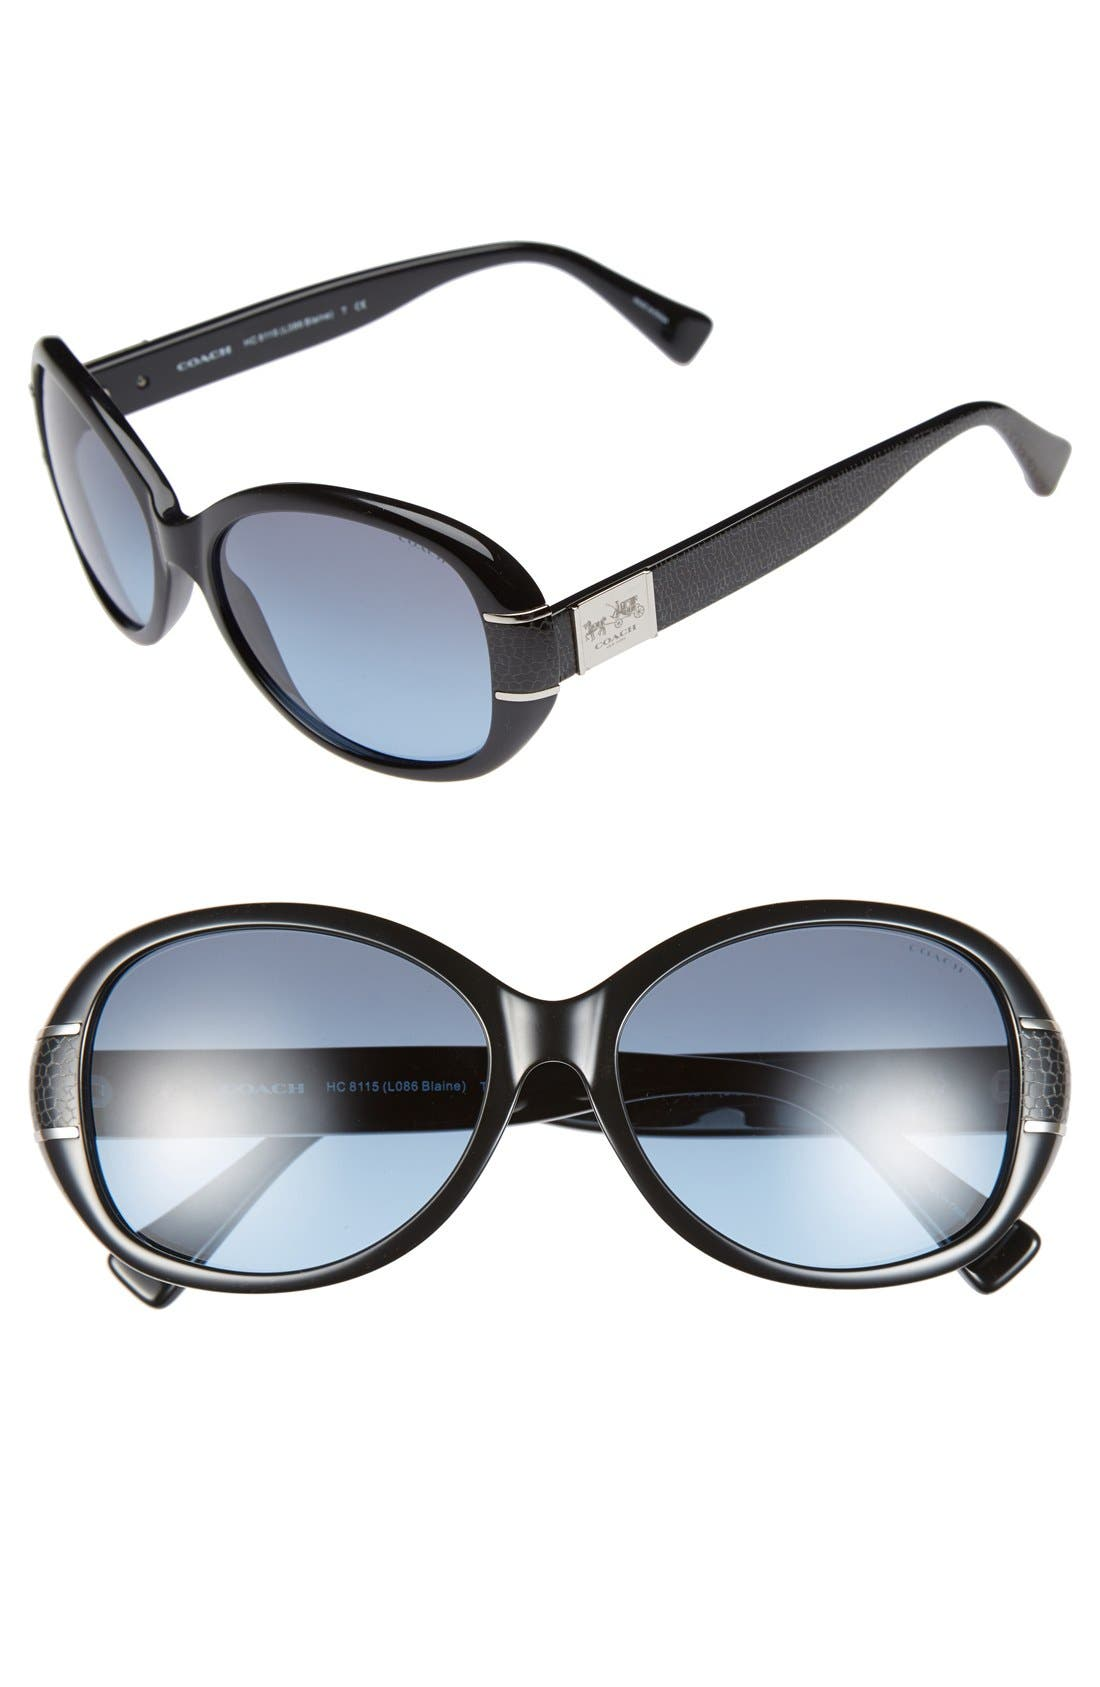 Alternate Image 1 Selected - COACH 'Blaine' 57mm Sunglasses